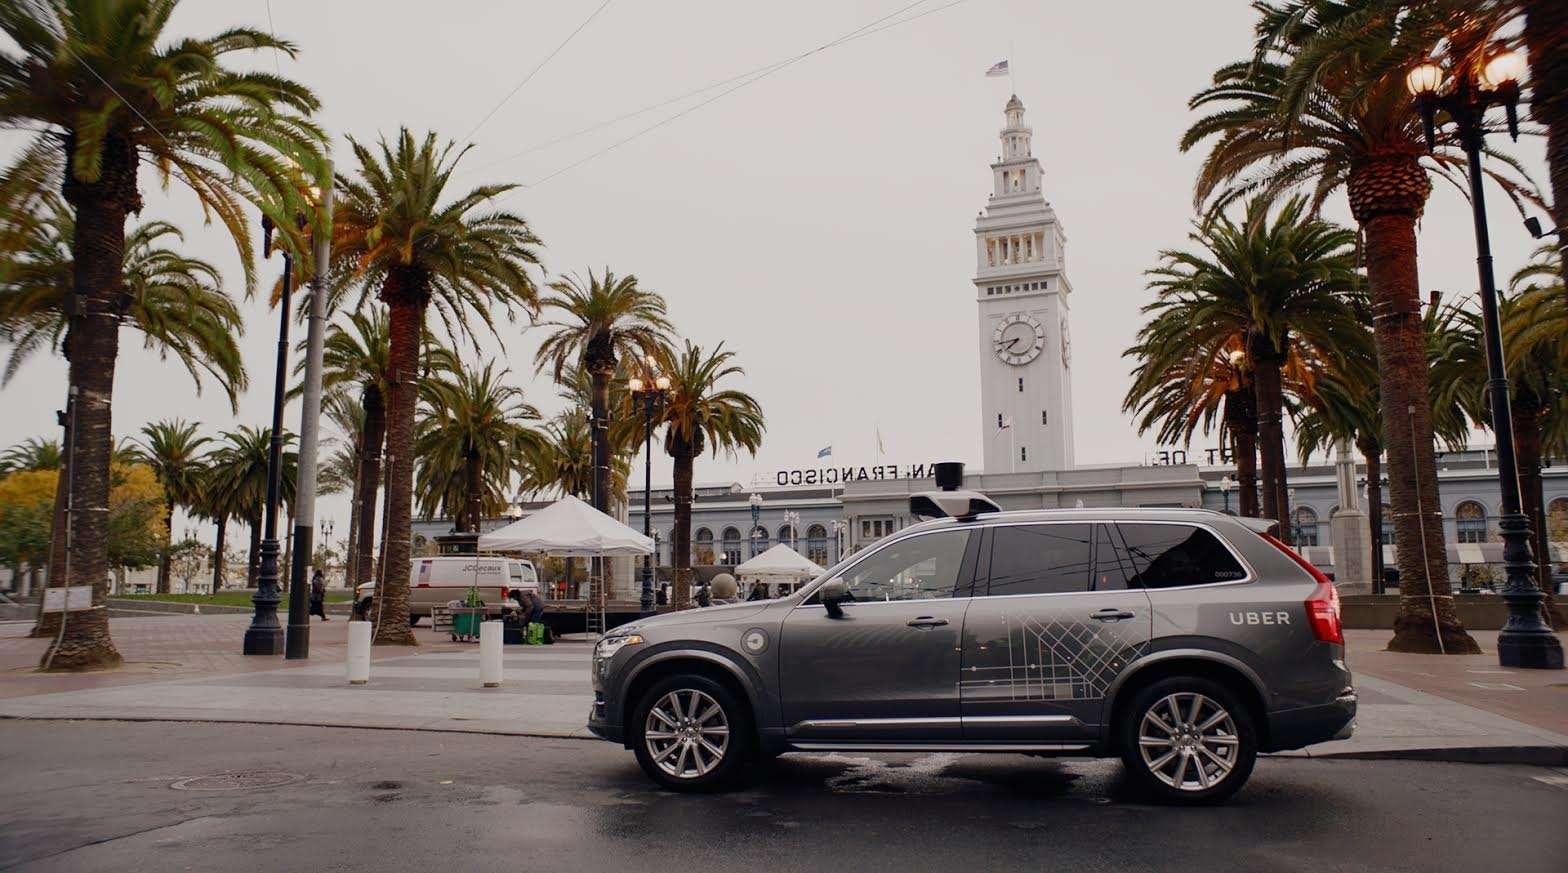 Uber self driving San Francisco